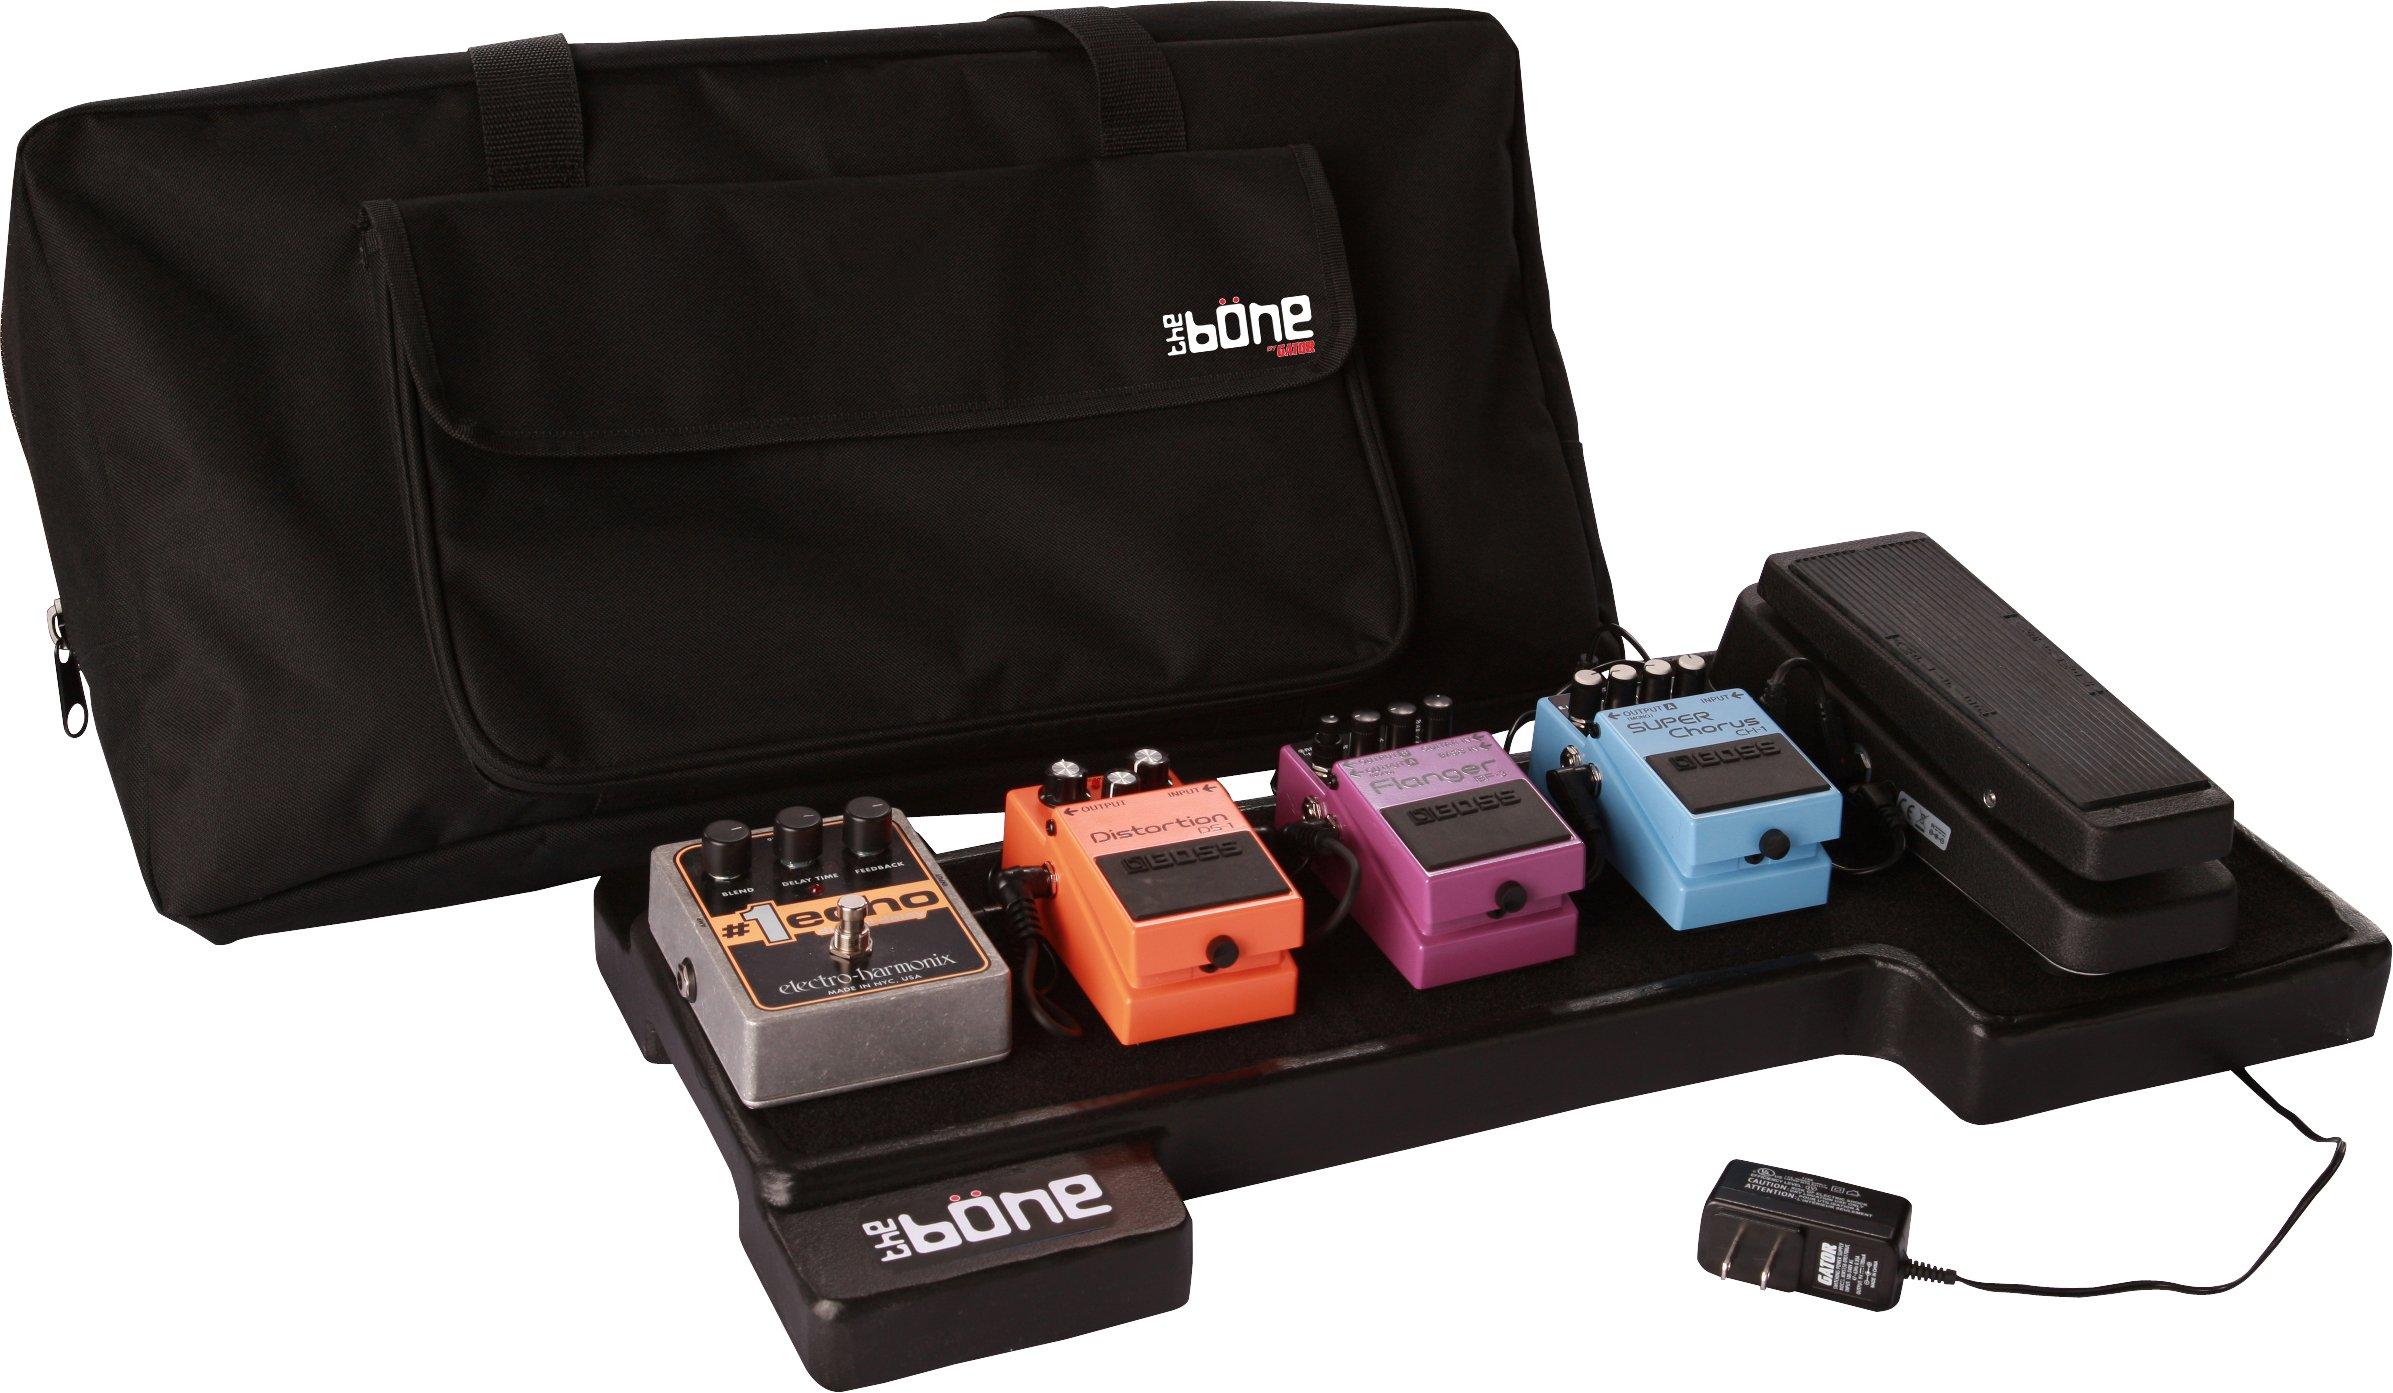 Gator Cases Bone Molded Polyethylene Guitar Pedal Board with Lightweight Carry Bag; USA Made, 23.75'' x 10.25'' x 2'' (G-BONE)